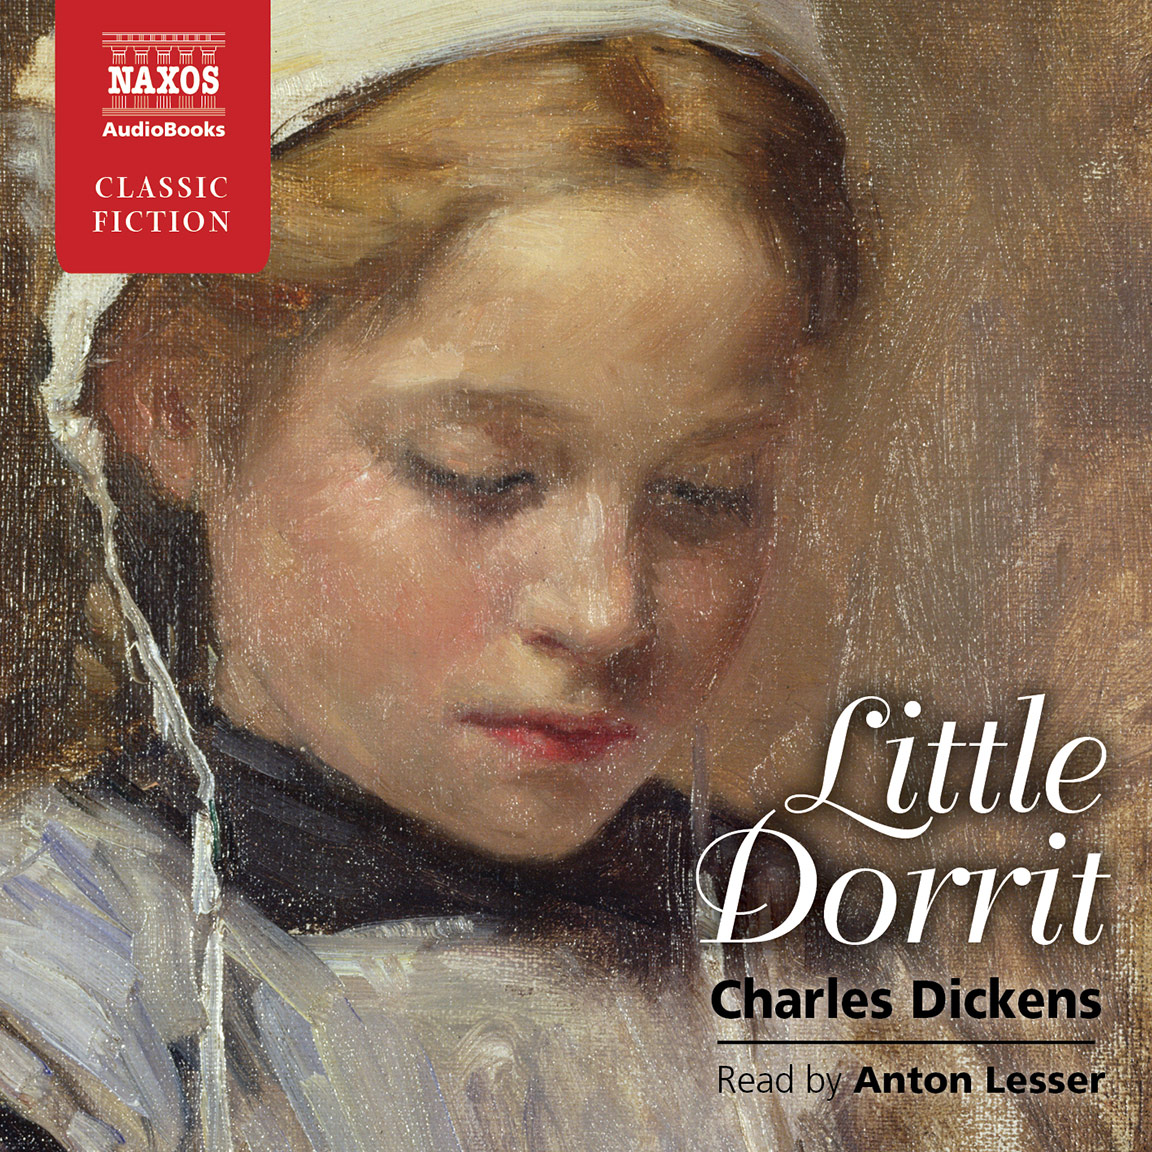 Little Dorrit (abridged)